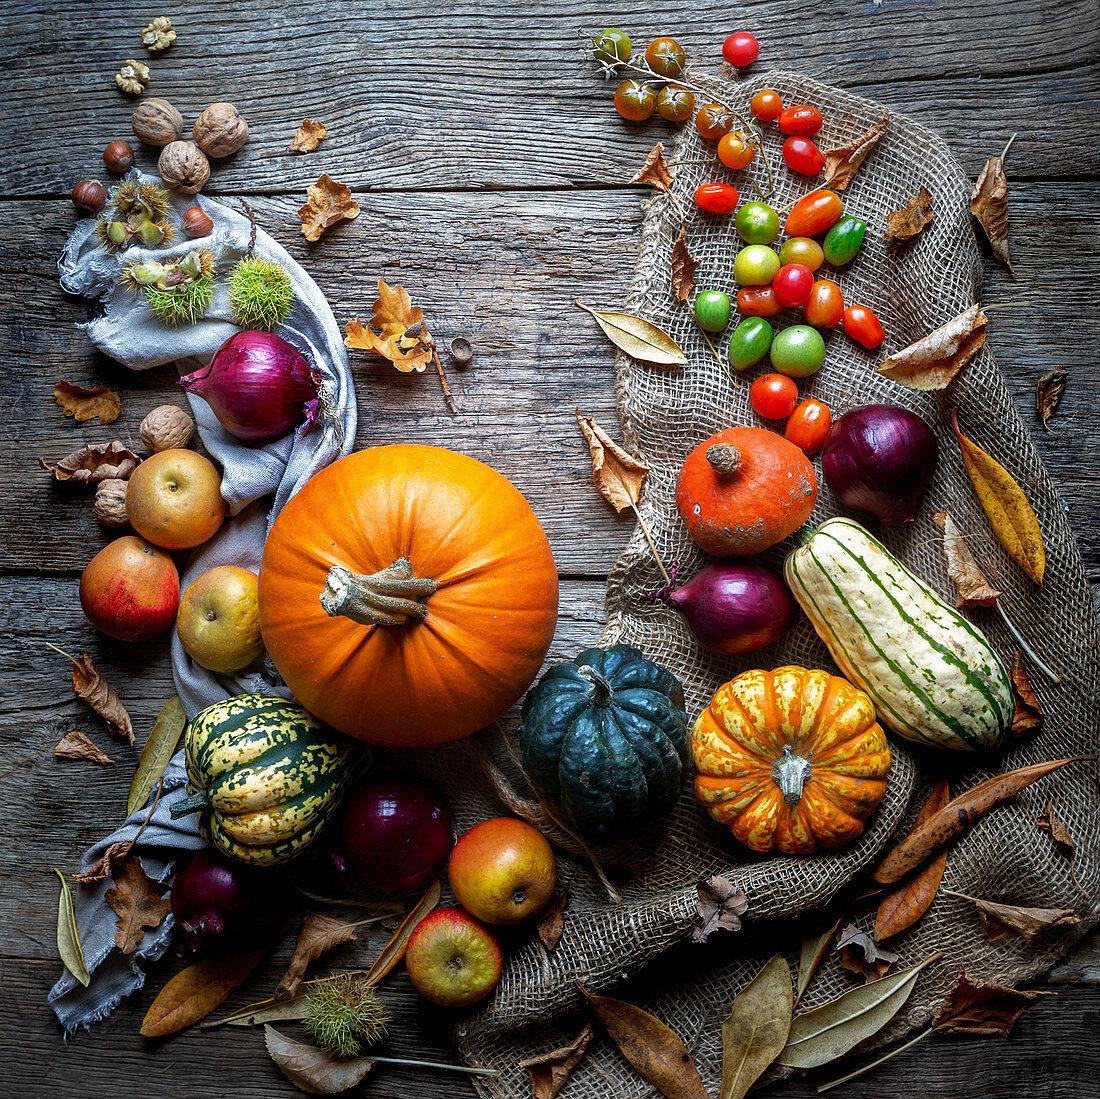 Pumpkins in Autumn setting